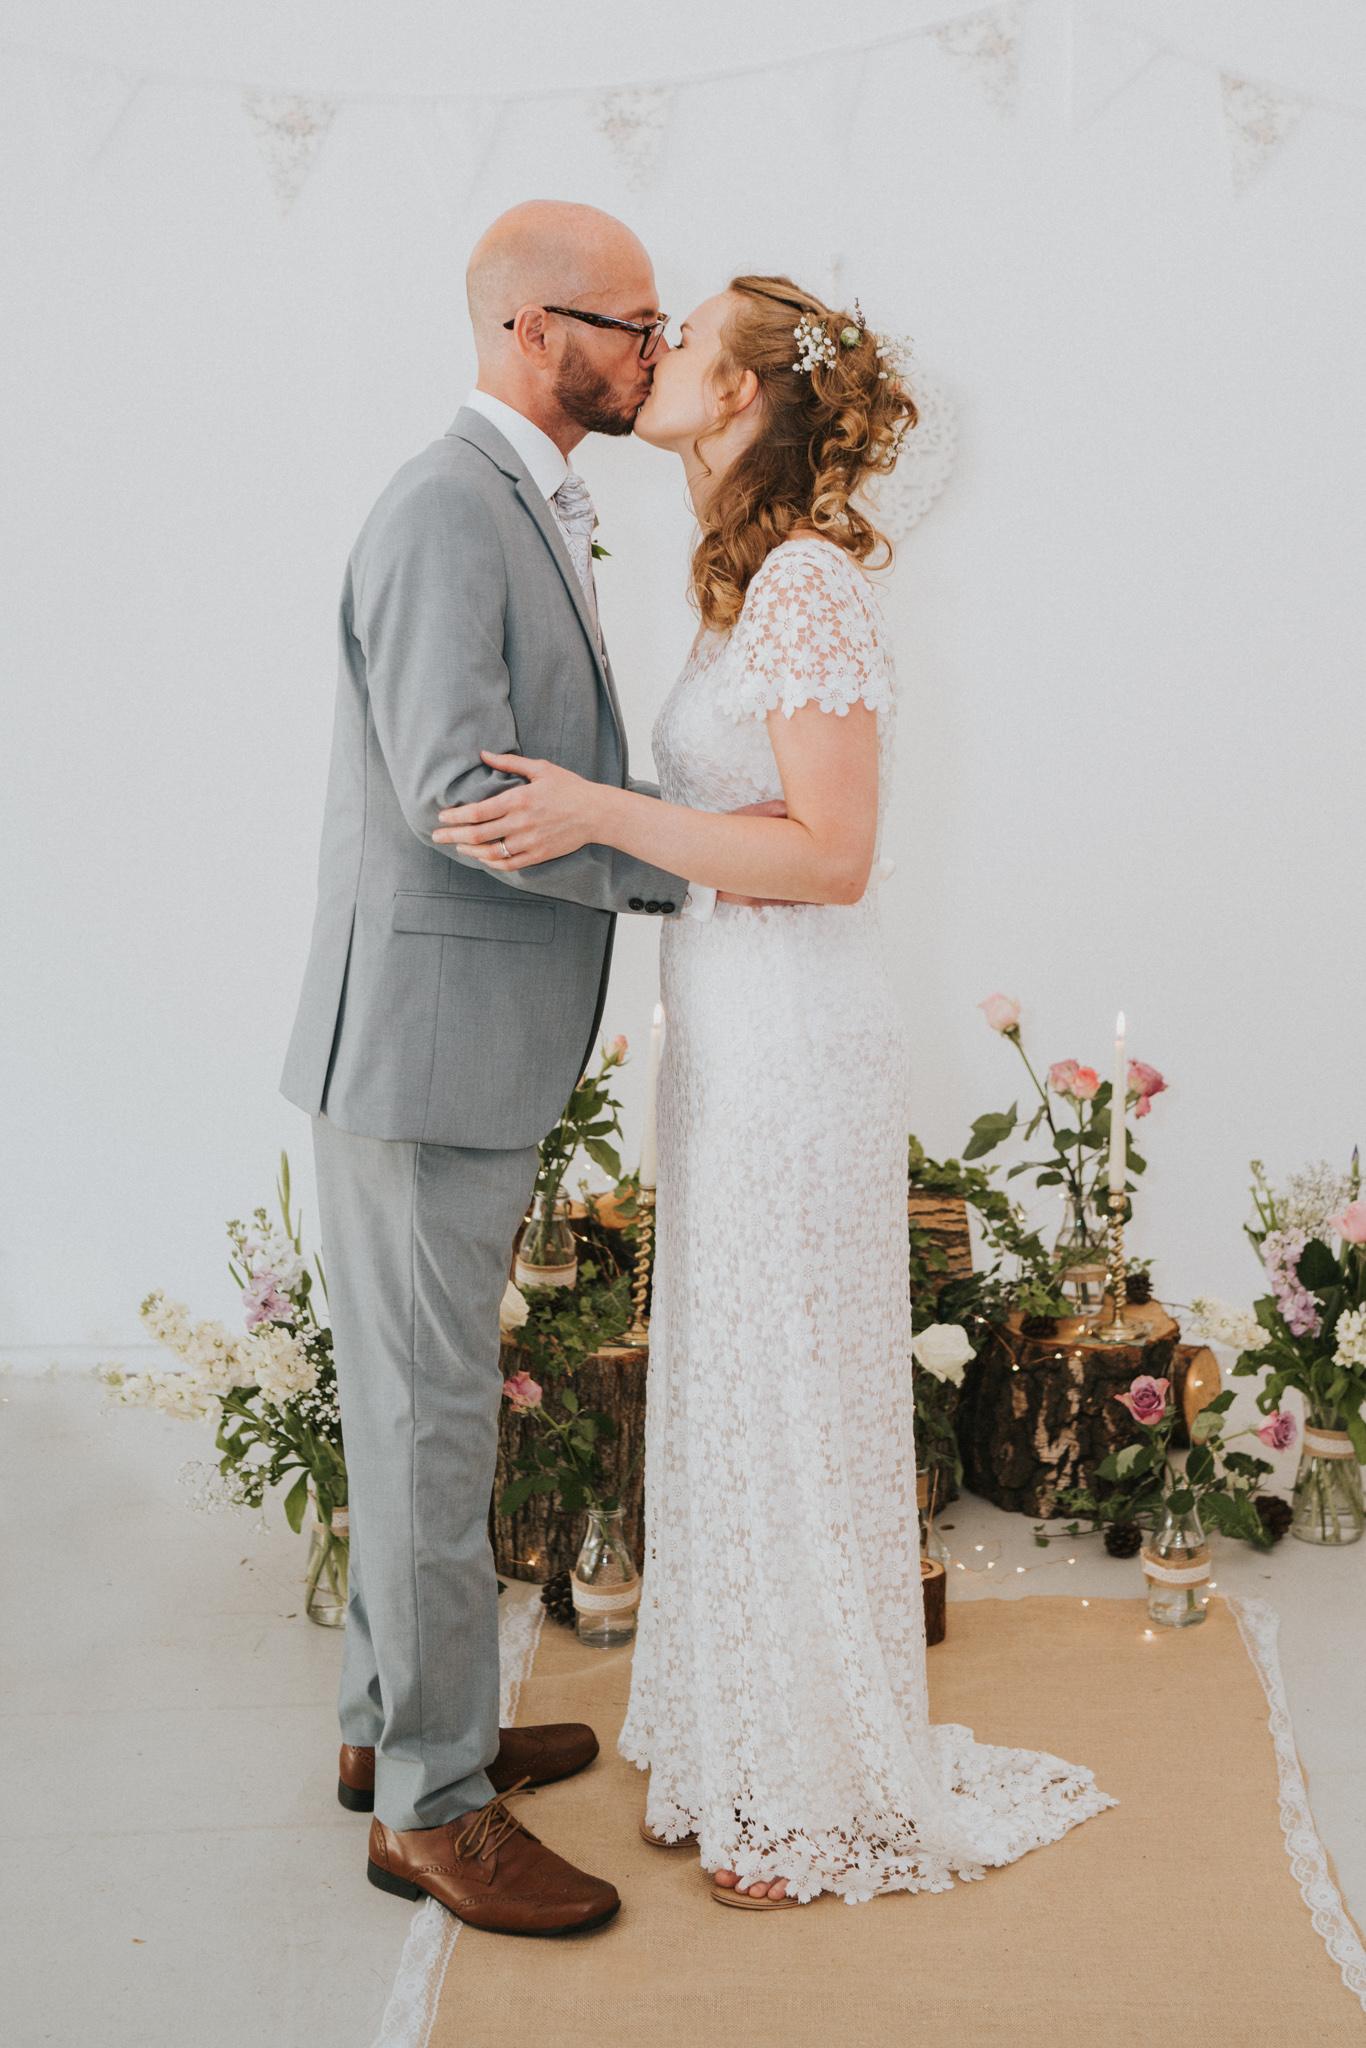 Georgie-Ketu-Firstsite-Wedding-Colchester-Essex-Grace-Elizabeth-Alternative-Wedding-Photographer (11 of 20).jpg